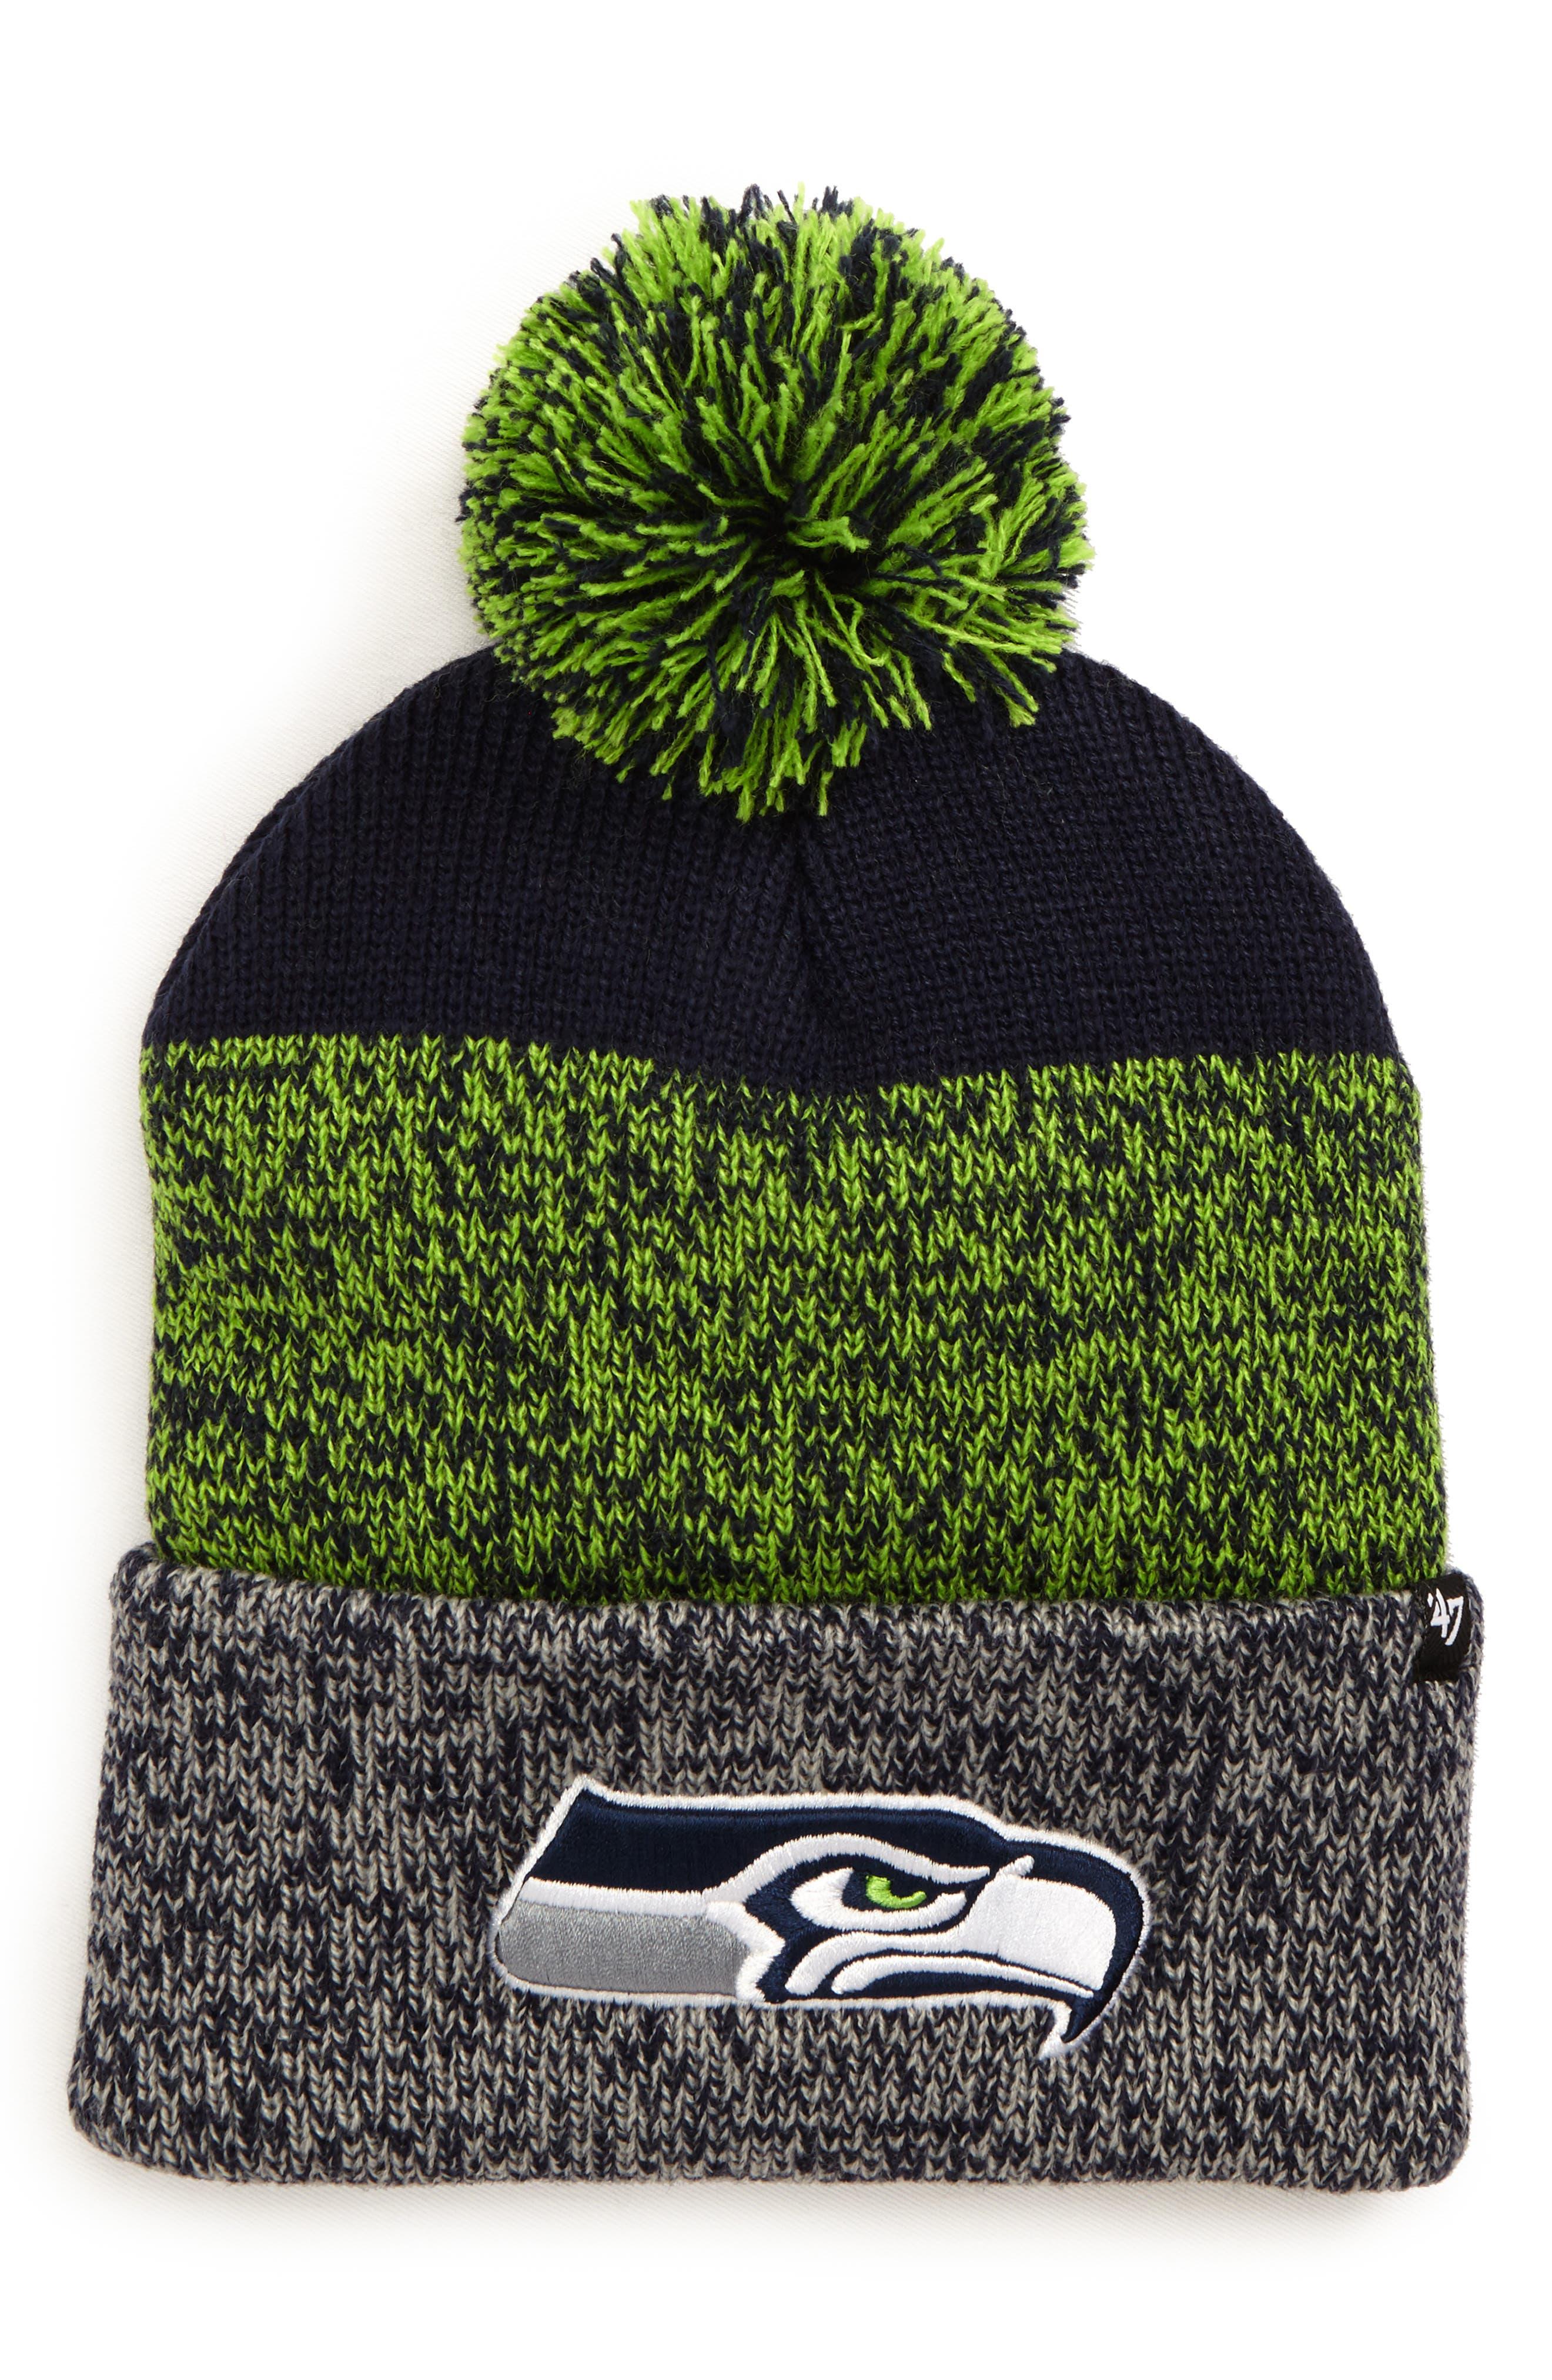 '47 Seattle Seahawks Static Cuff Knit Beanie